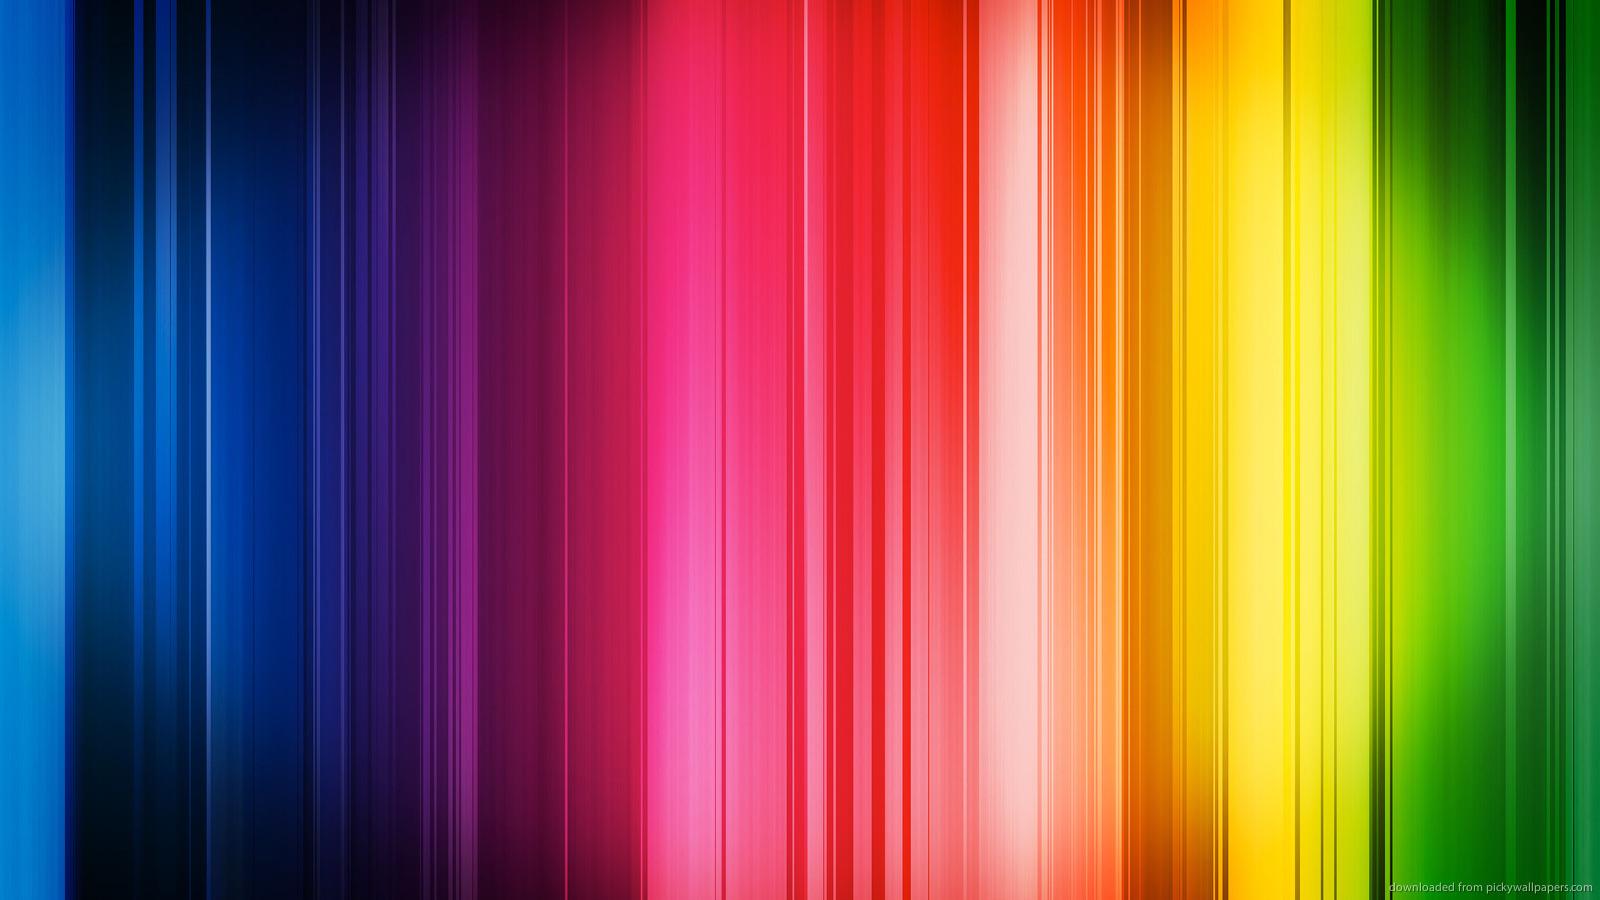 Download 1600x900 Colorful Stripes Wallpaper 1600x900